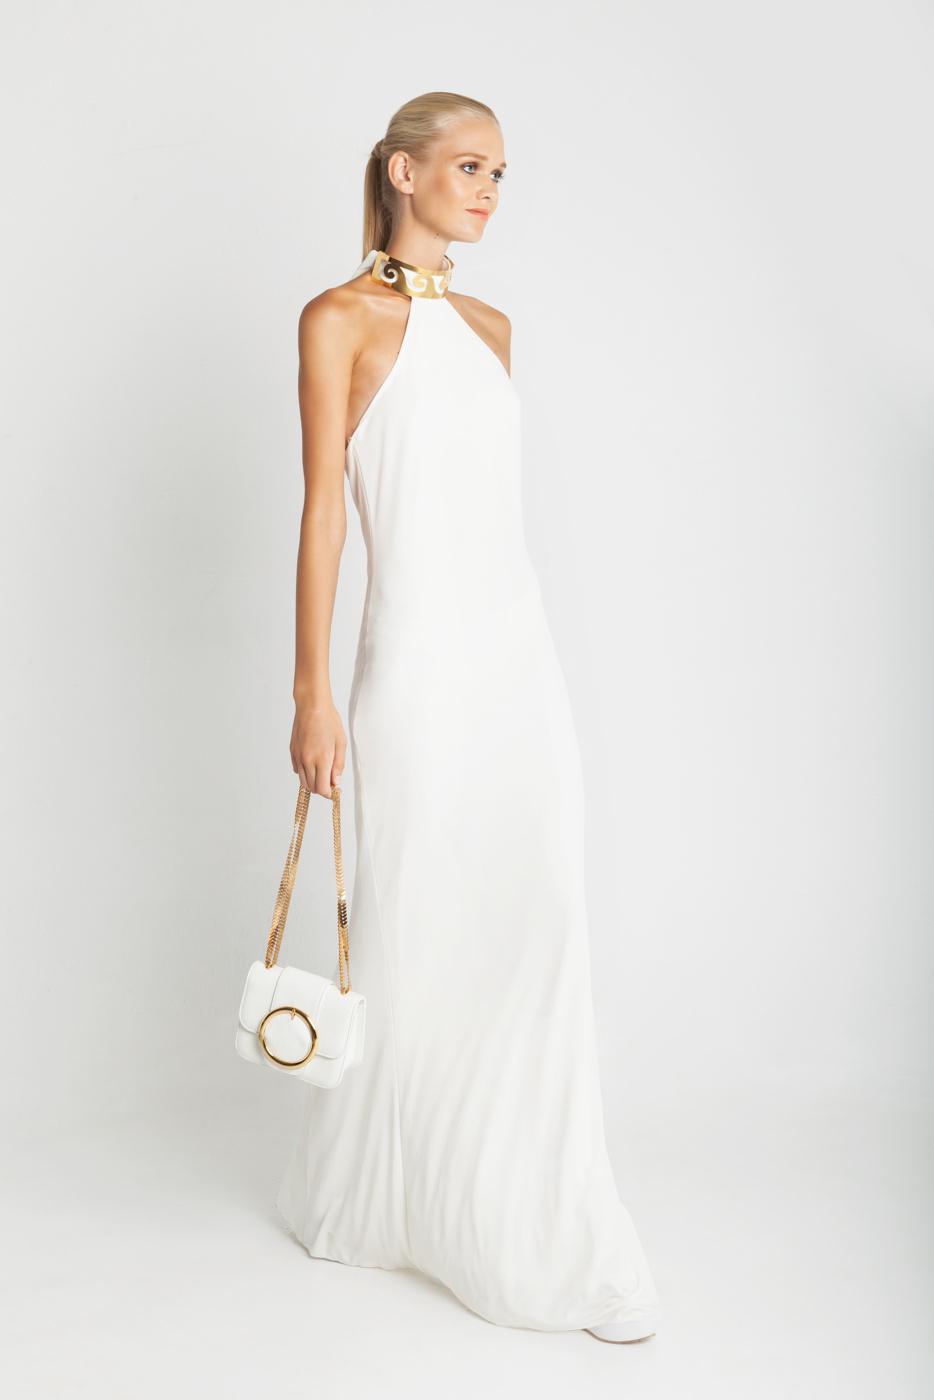 3741c5a589f9 Βρήκαμε το υπέροχο λευκό μάξι φόρεμα της Κέλλυς Κελεκίδου στη ...